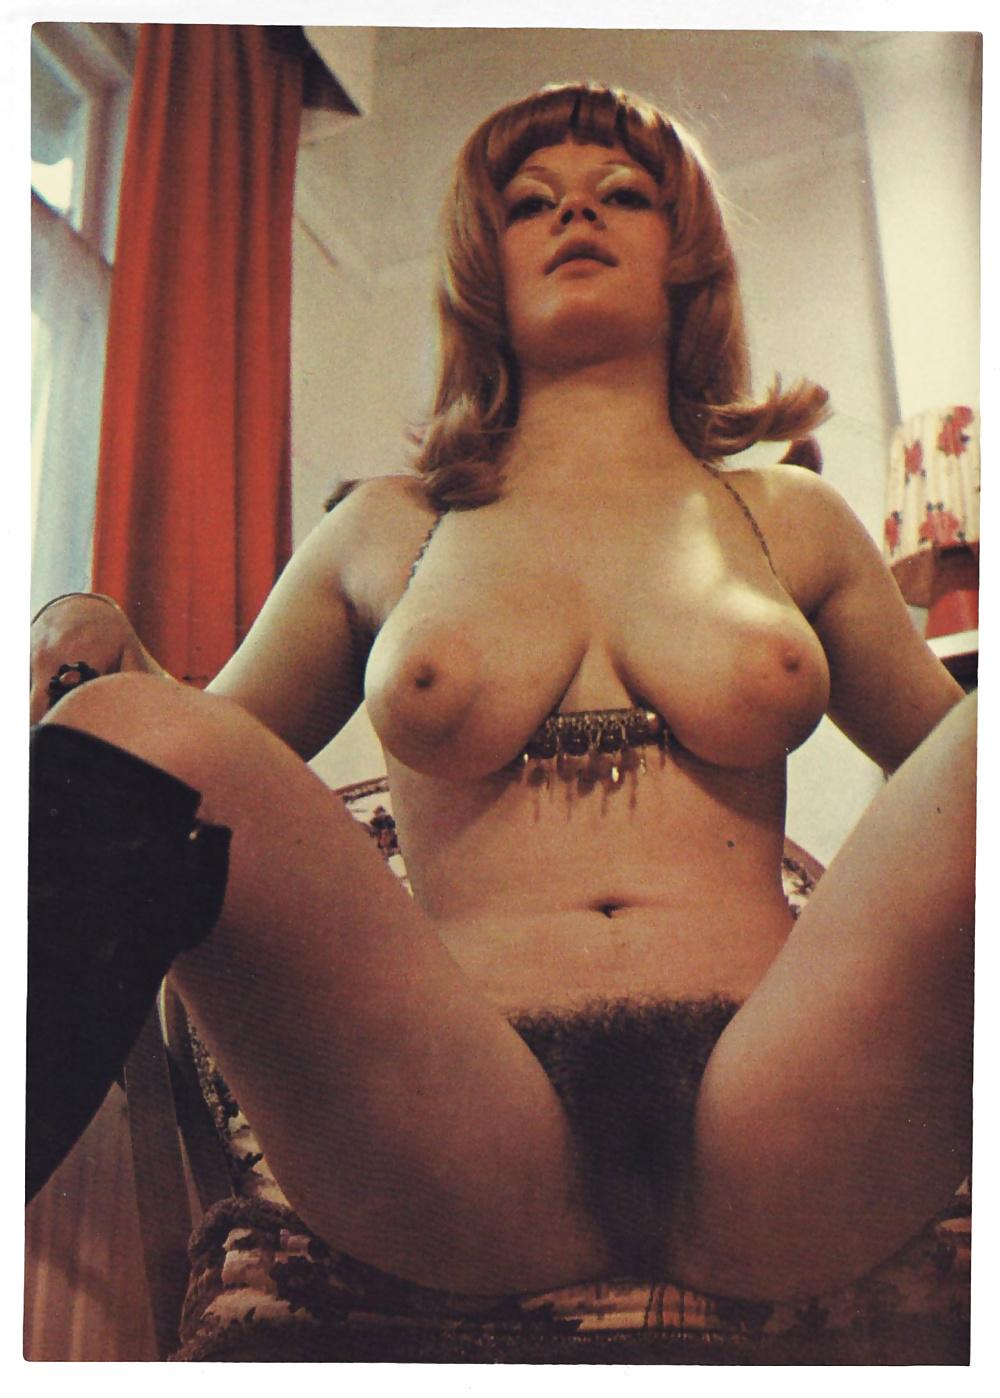 retro-foto-bolshie-soski-last-kendra-porno-foto-anal